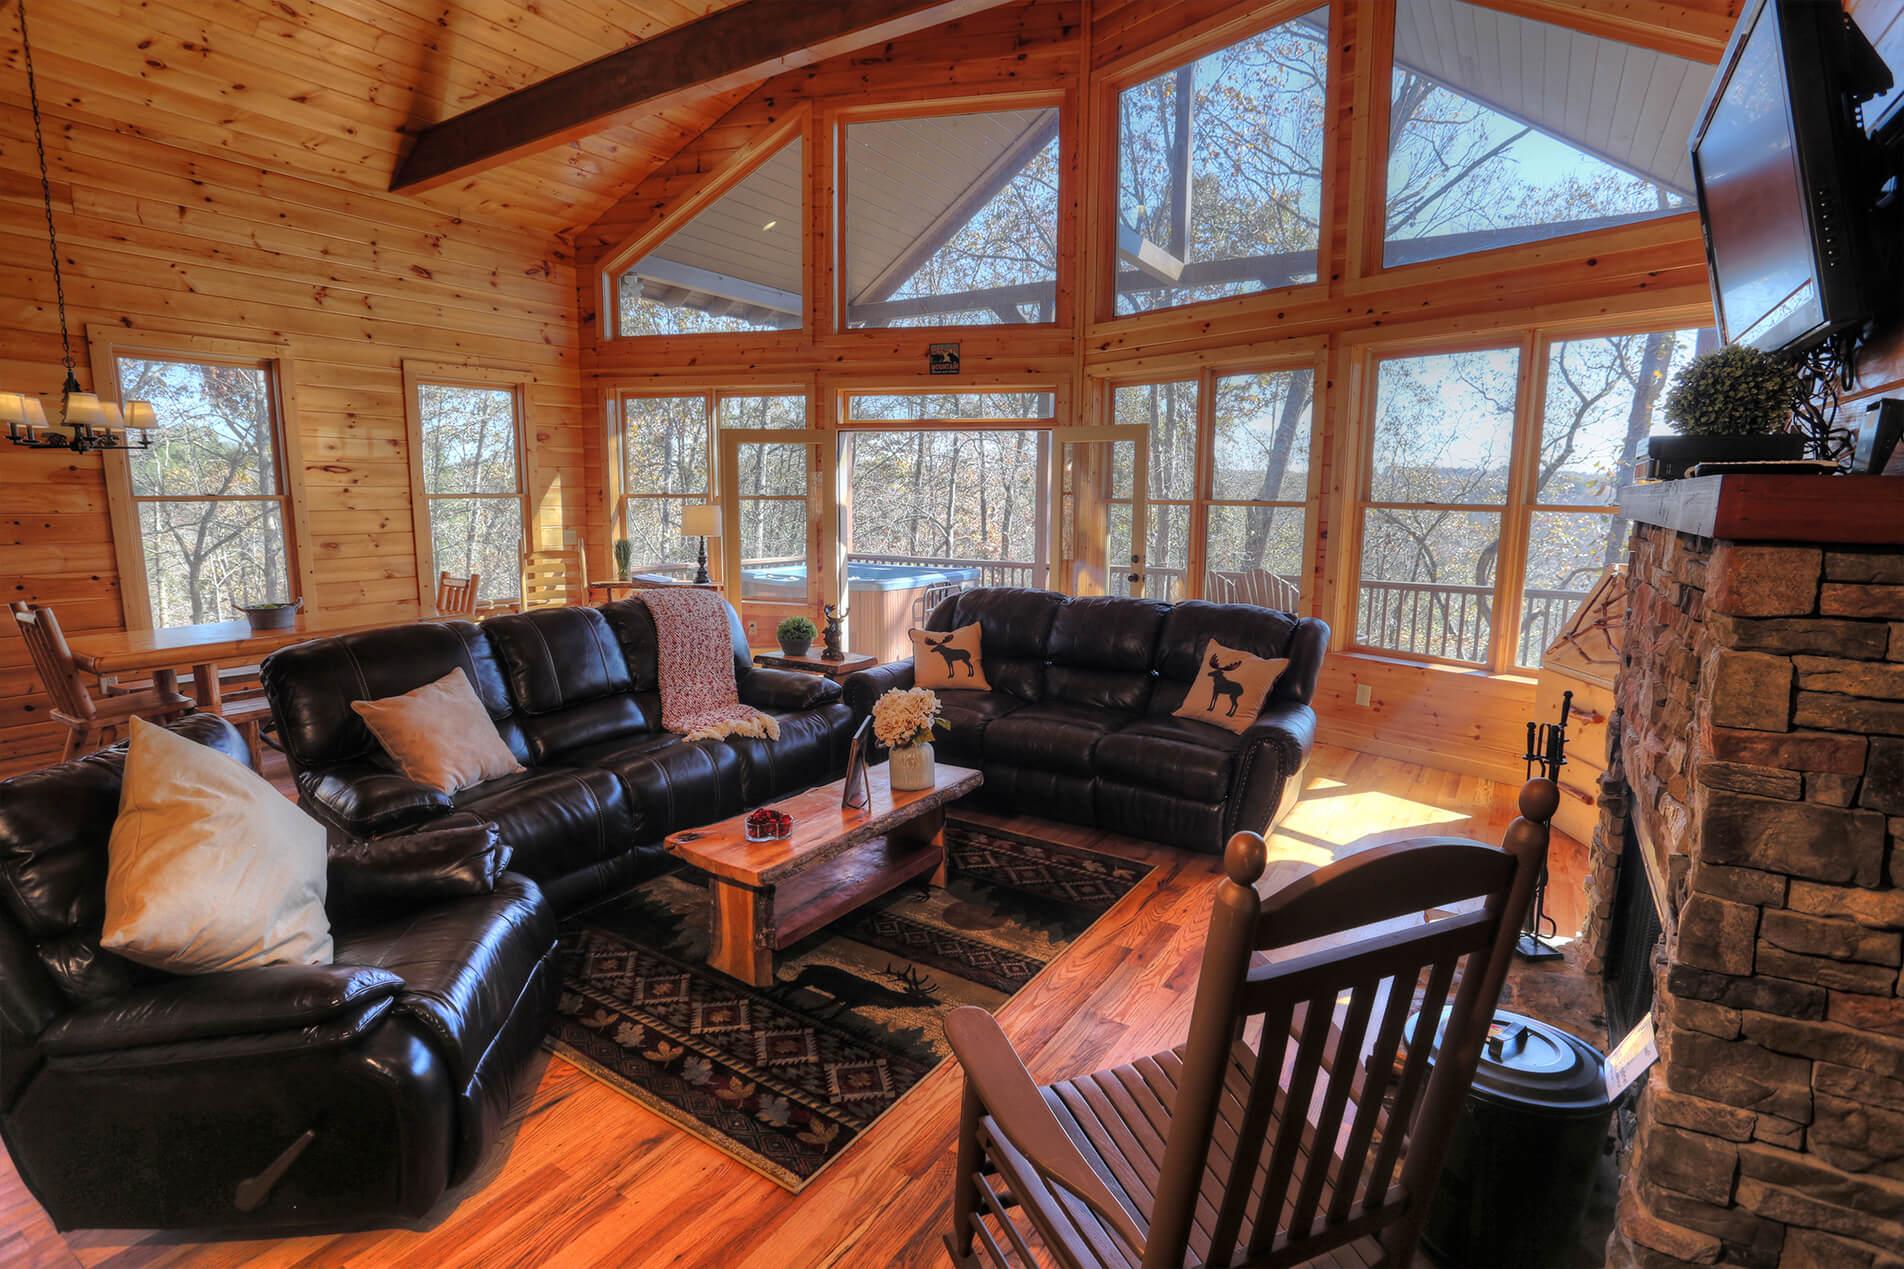 River-Wild-Cedar-Creek-Cabin-Rentals-Helen-Georgia-top-banner-2-1